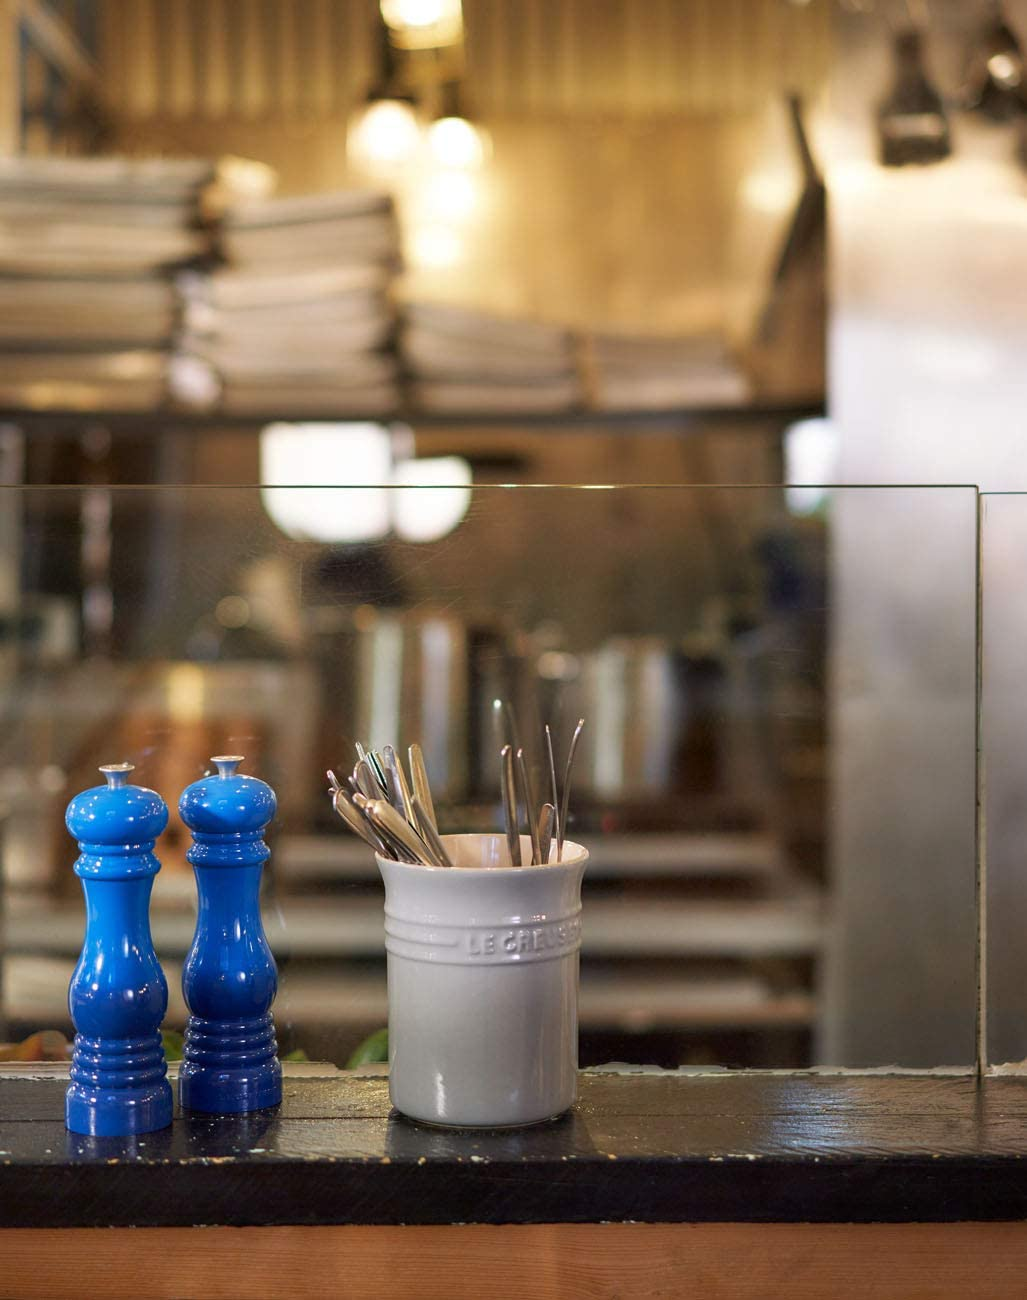 Macina in Ceramica Bianco Plastica ABS Le Creuset Macinino Sale 6.2 x 6.2 x 20.8 cm